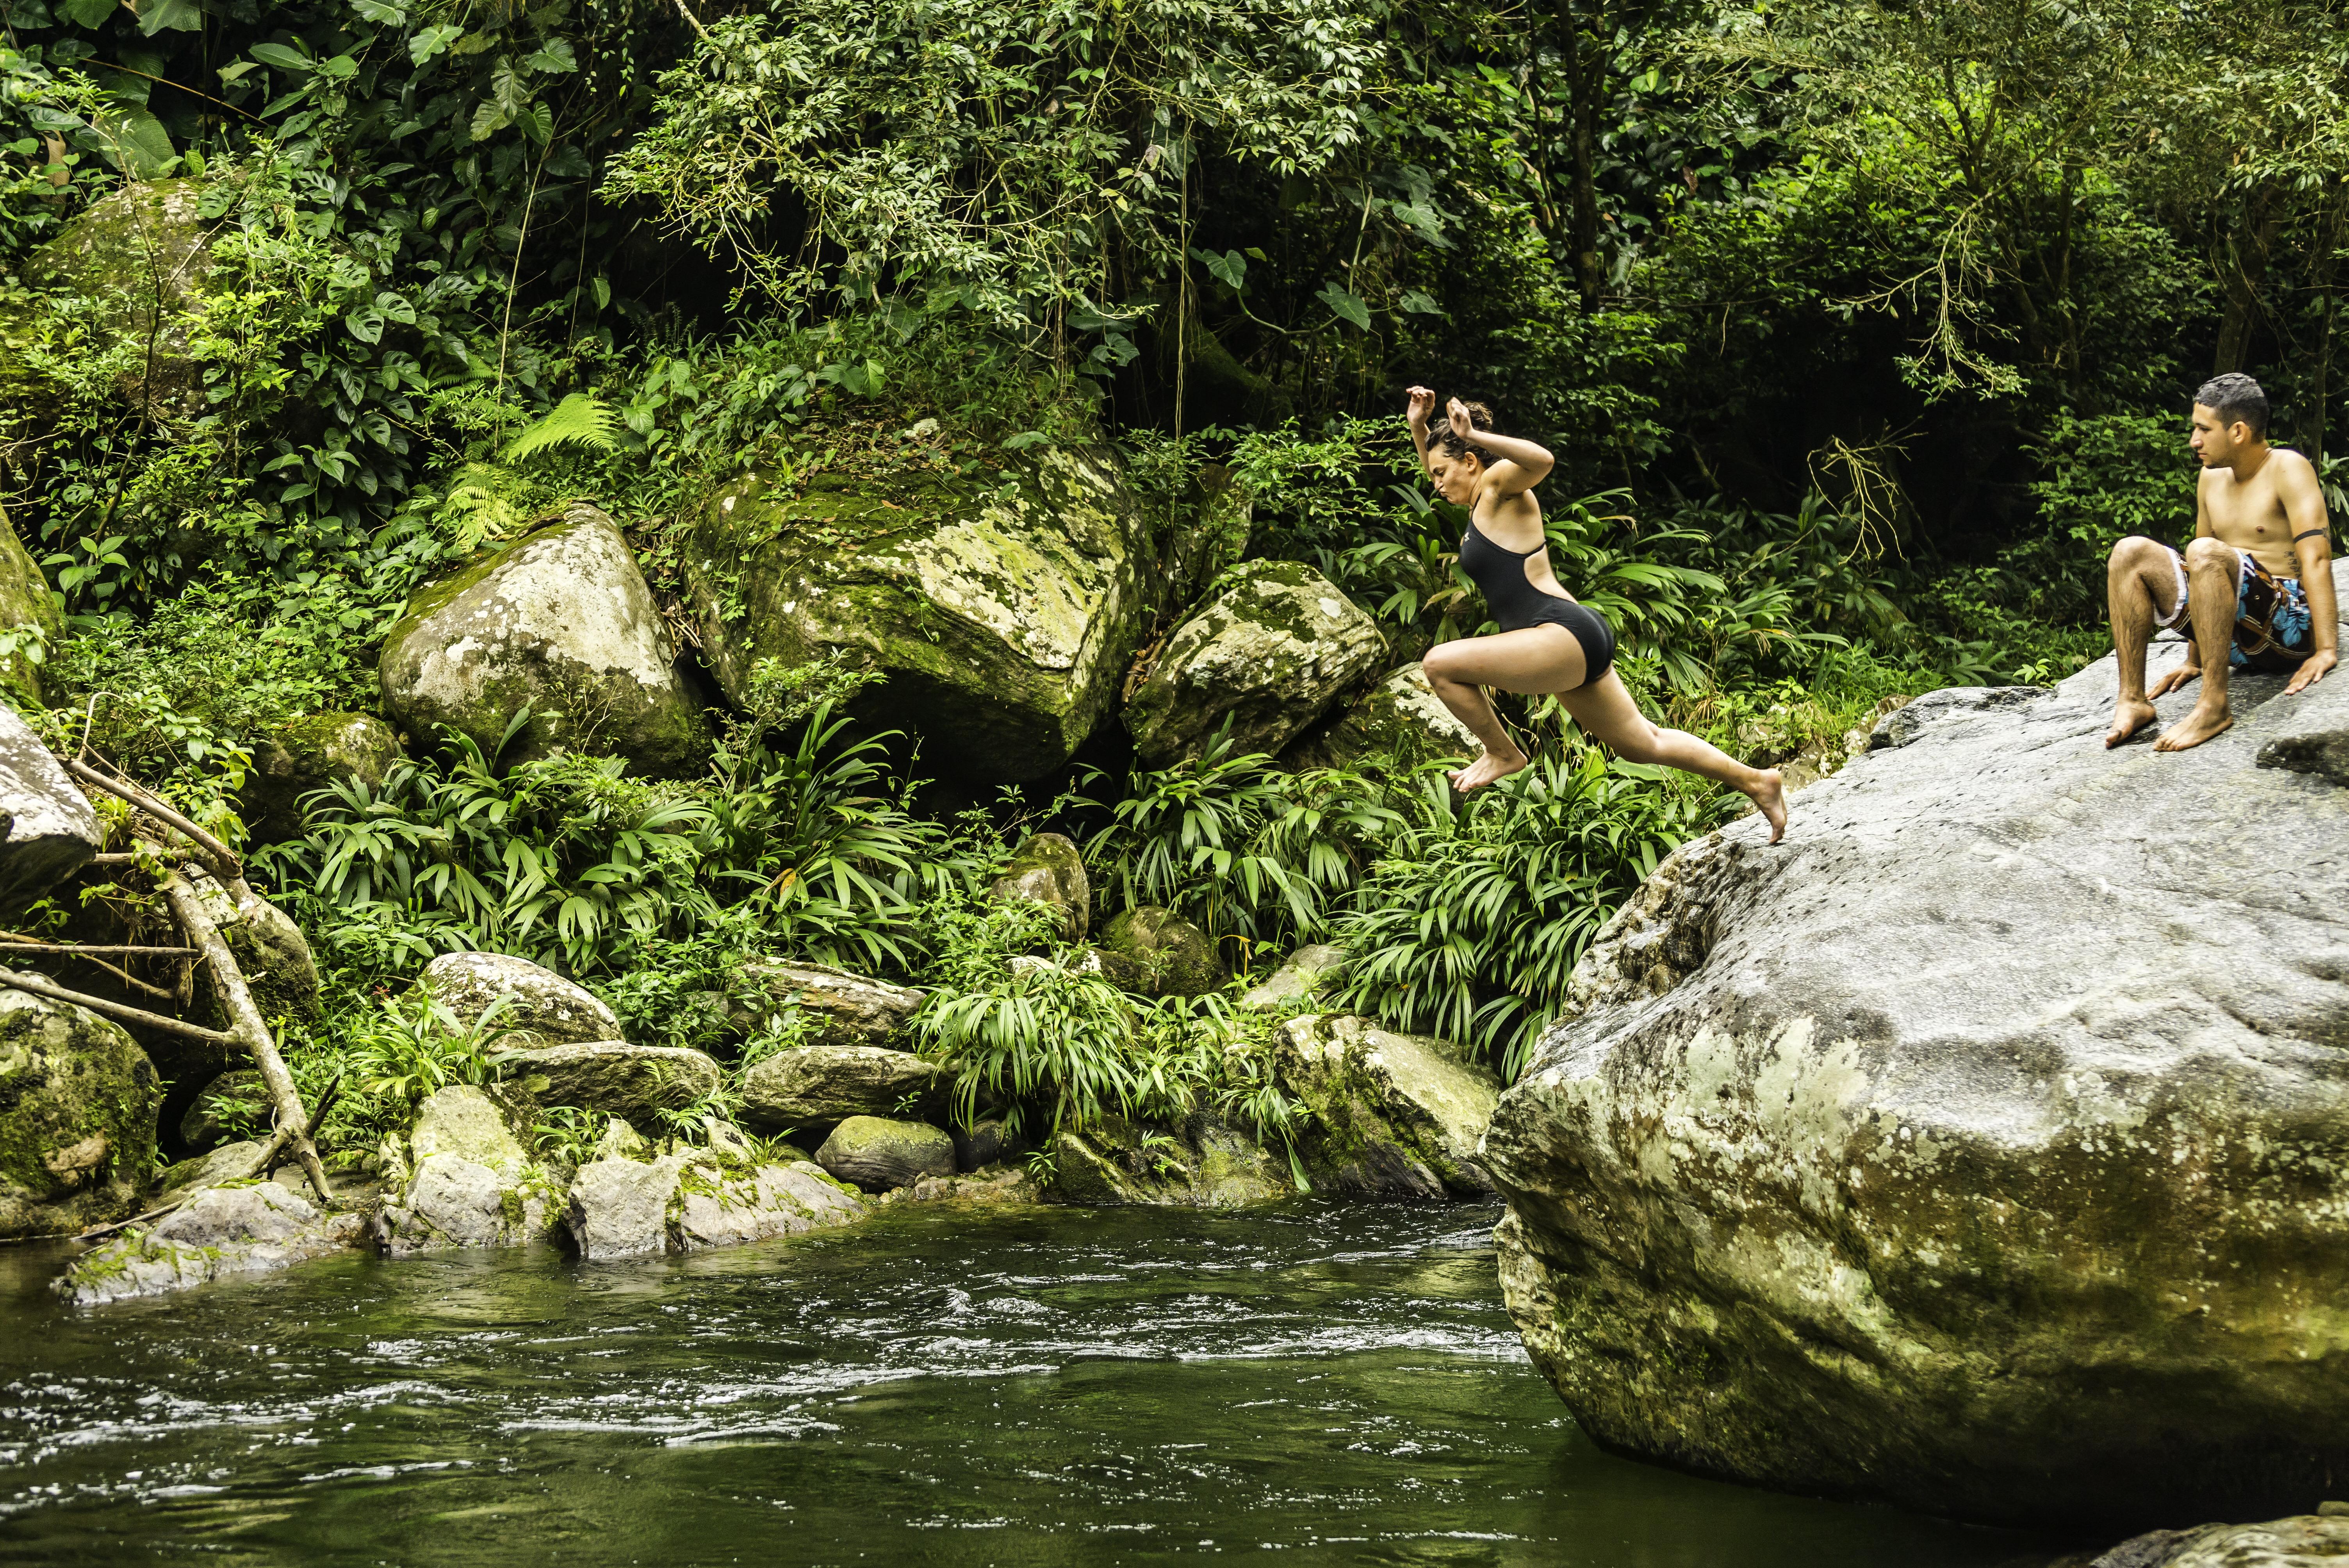 Feriel braving a jump